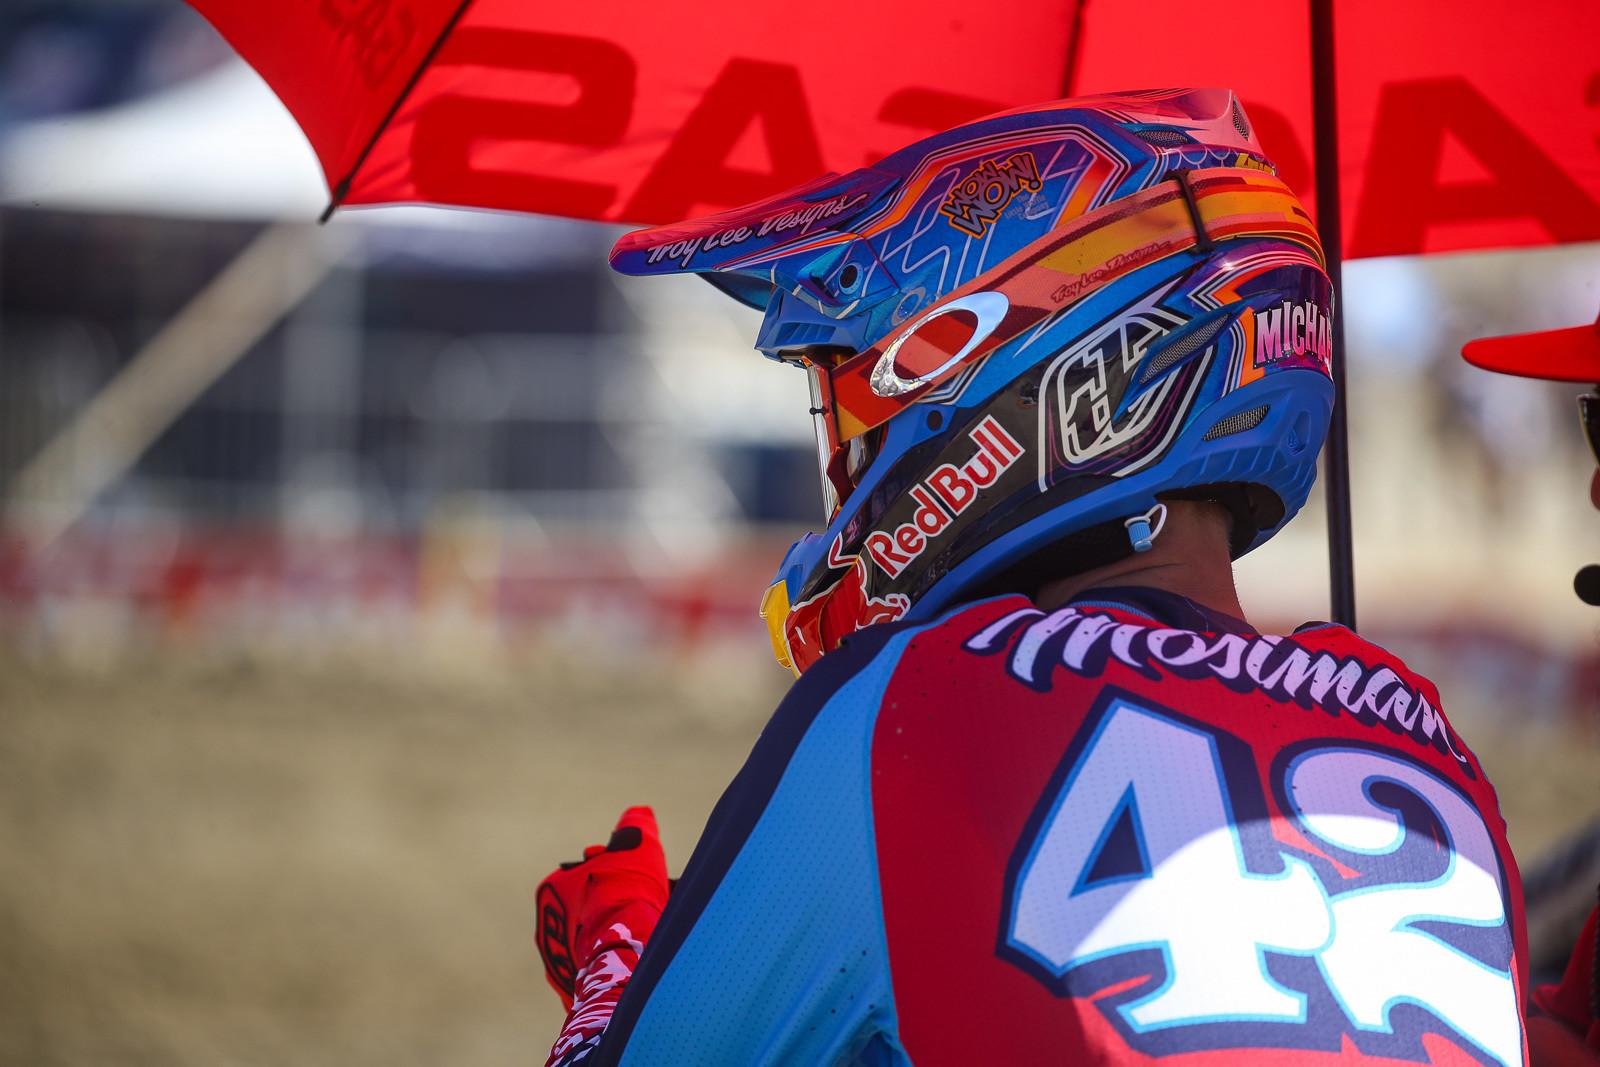 Hey, wait, is that a new TLD helmet on Michael Mosiman?